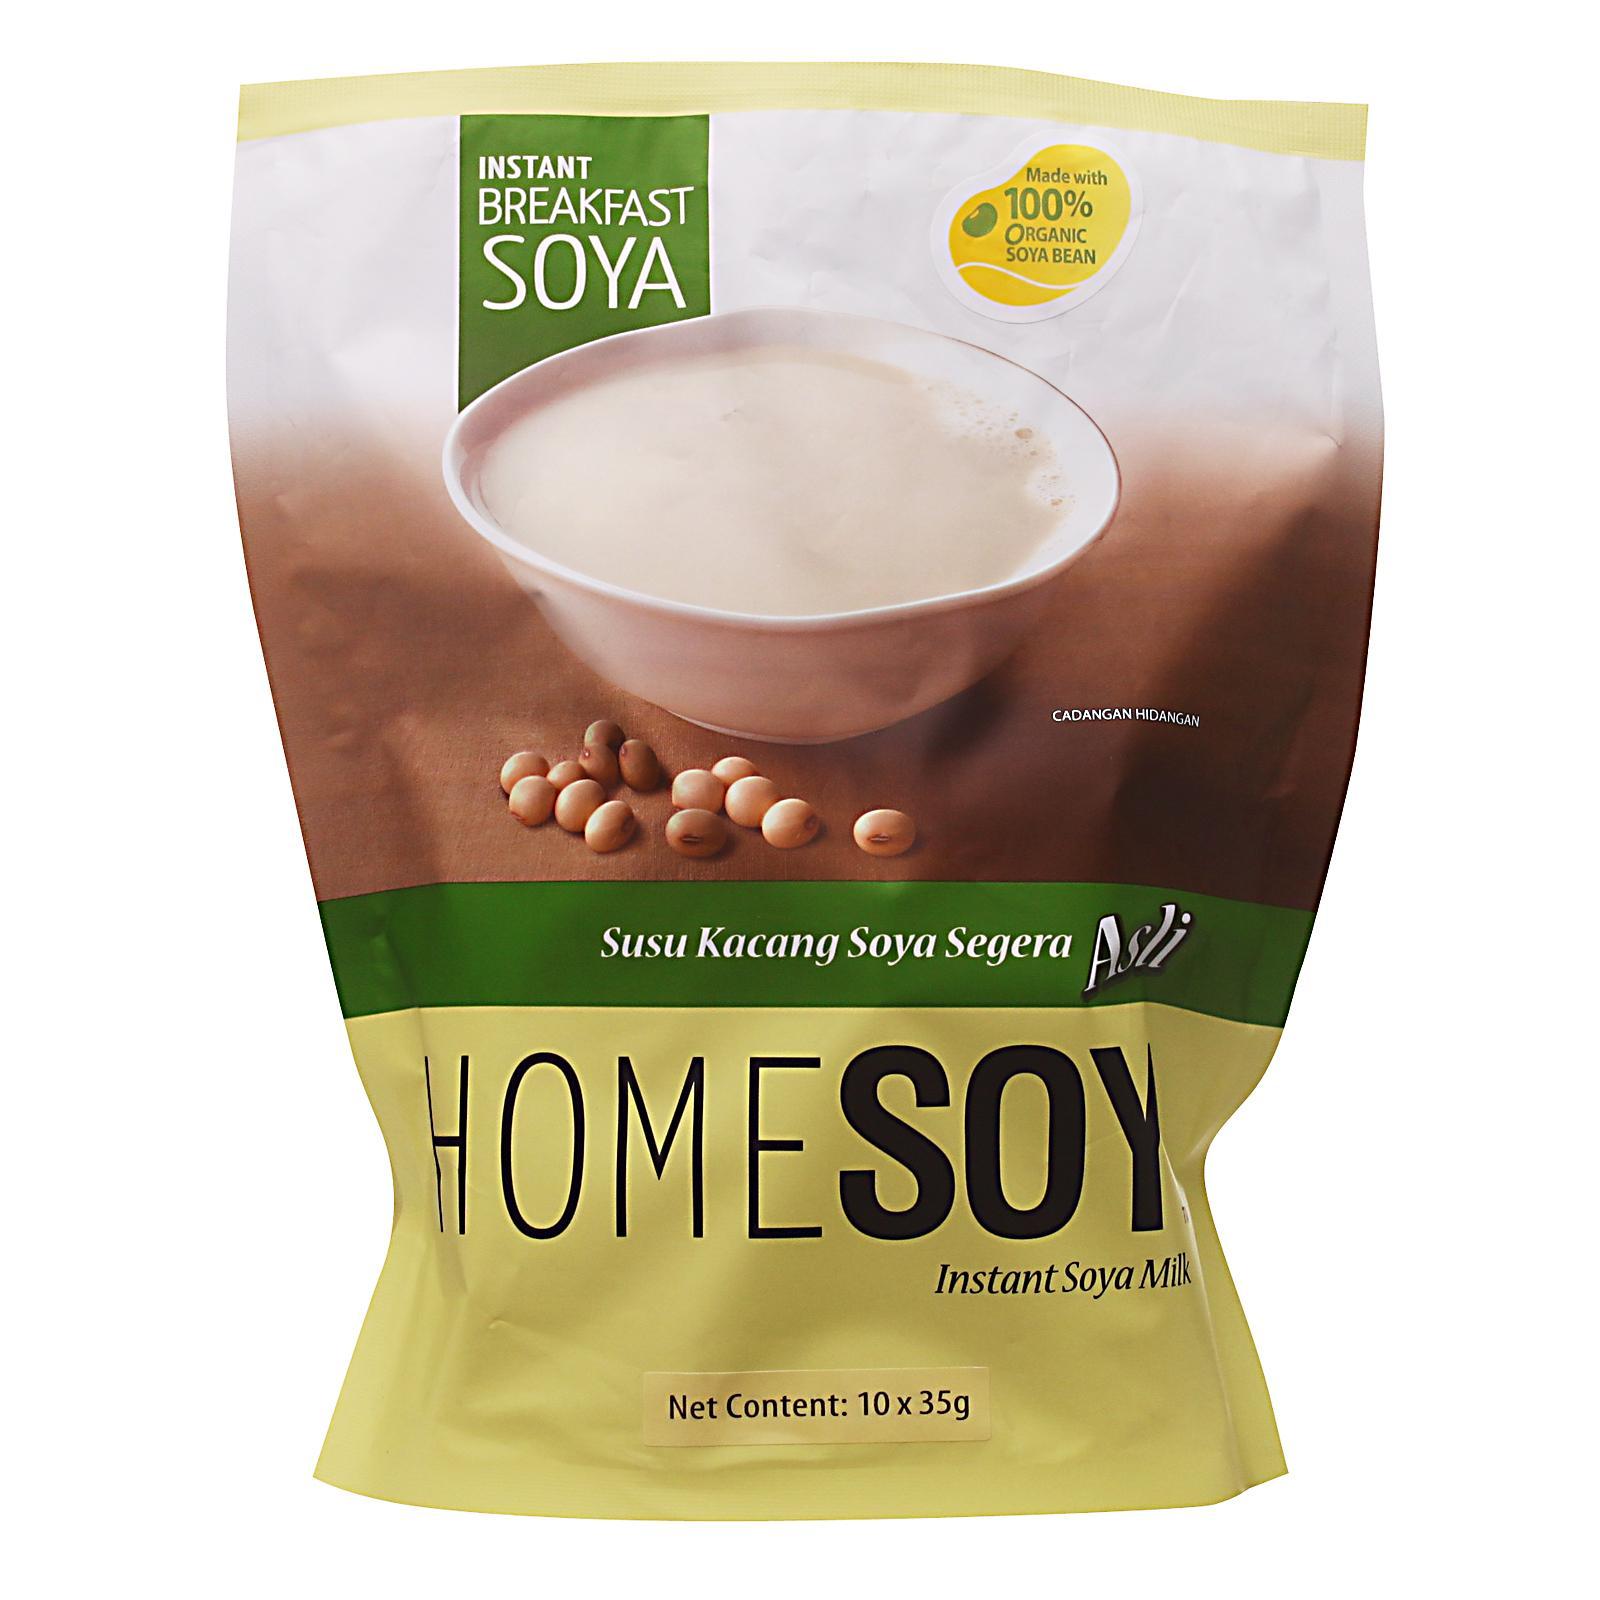 Homesoy Instant Original Flavor Soya Milk